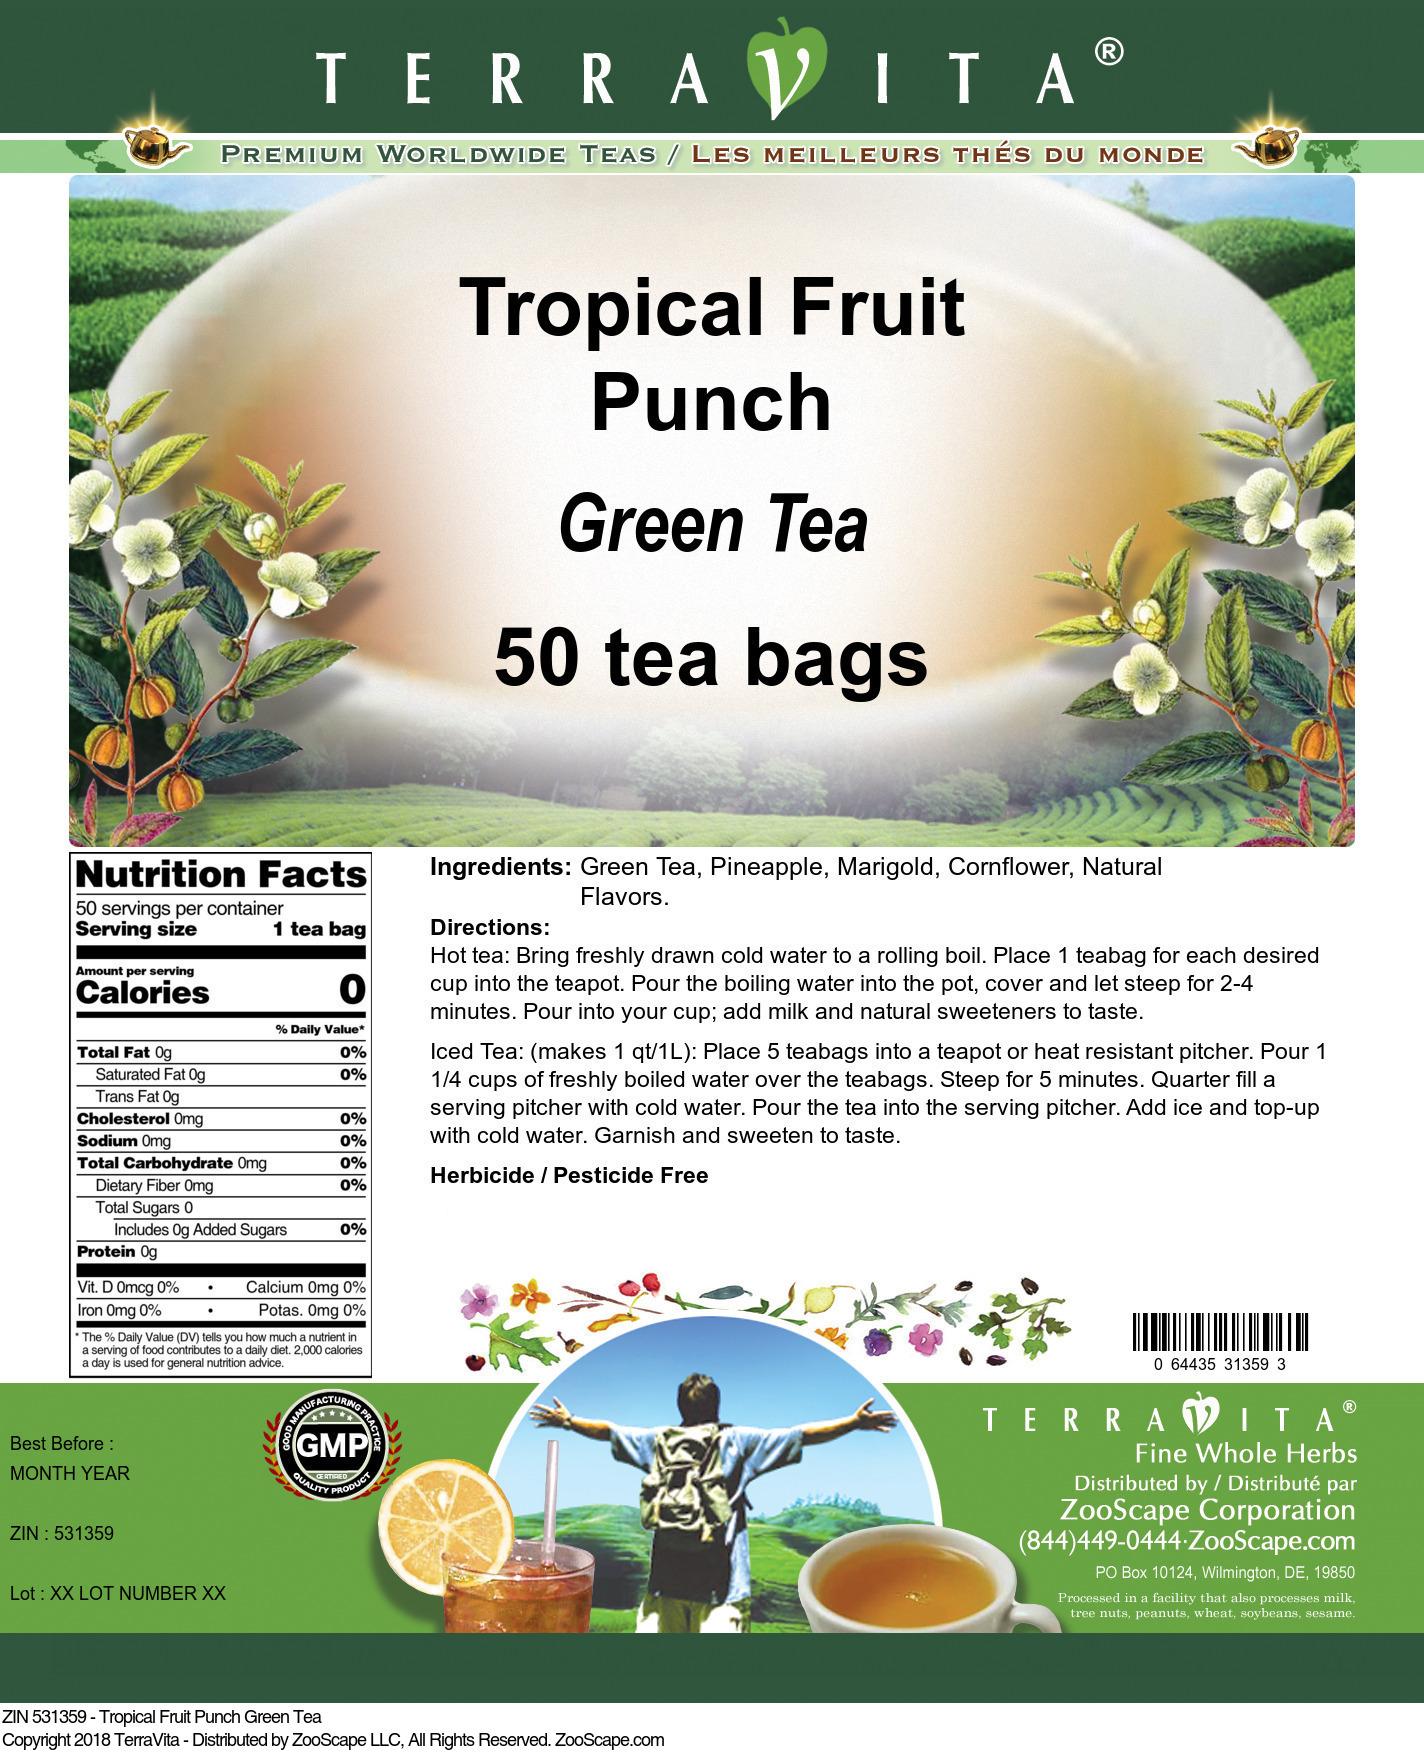 Tropical Fruit Punch Green Tea